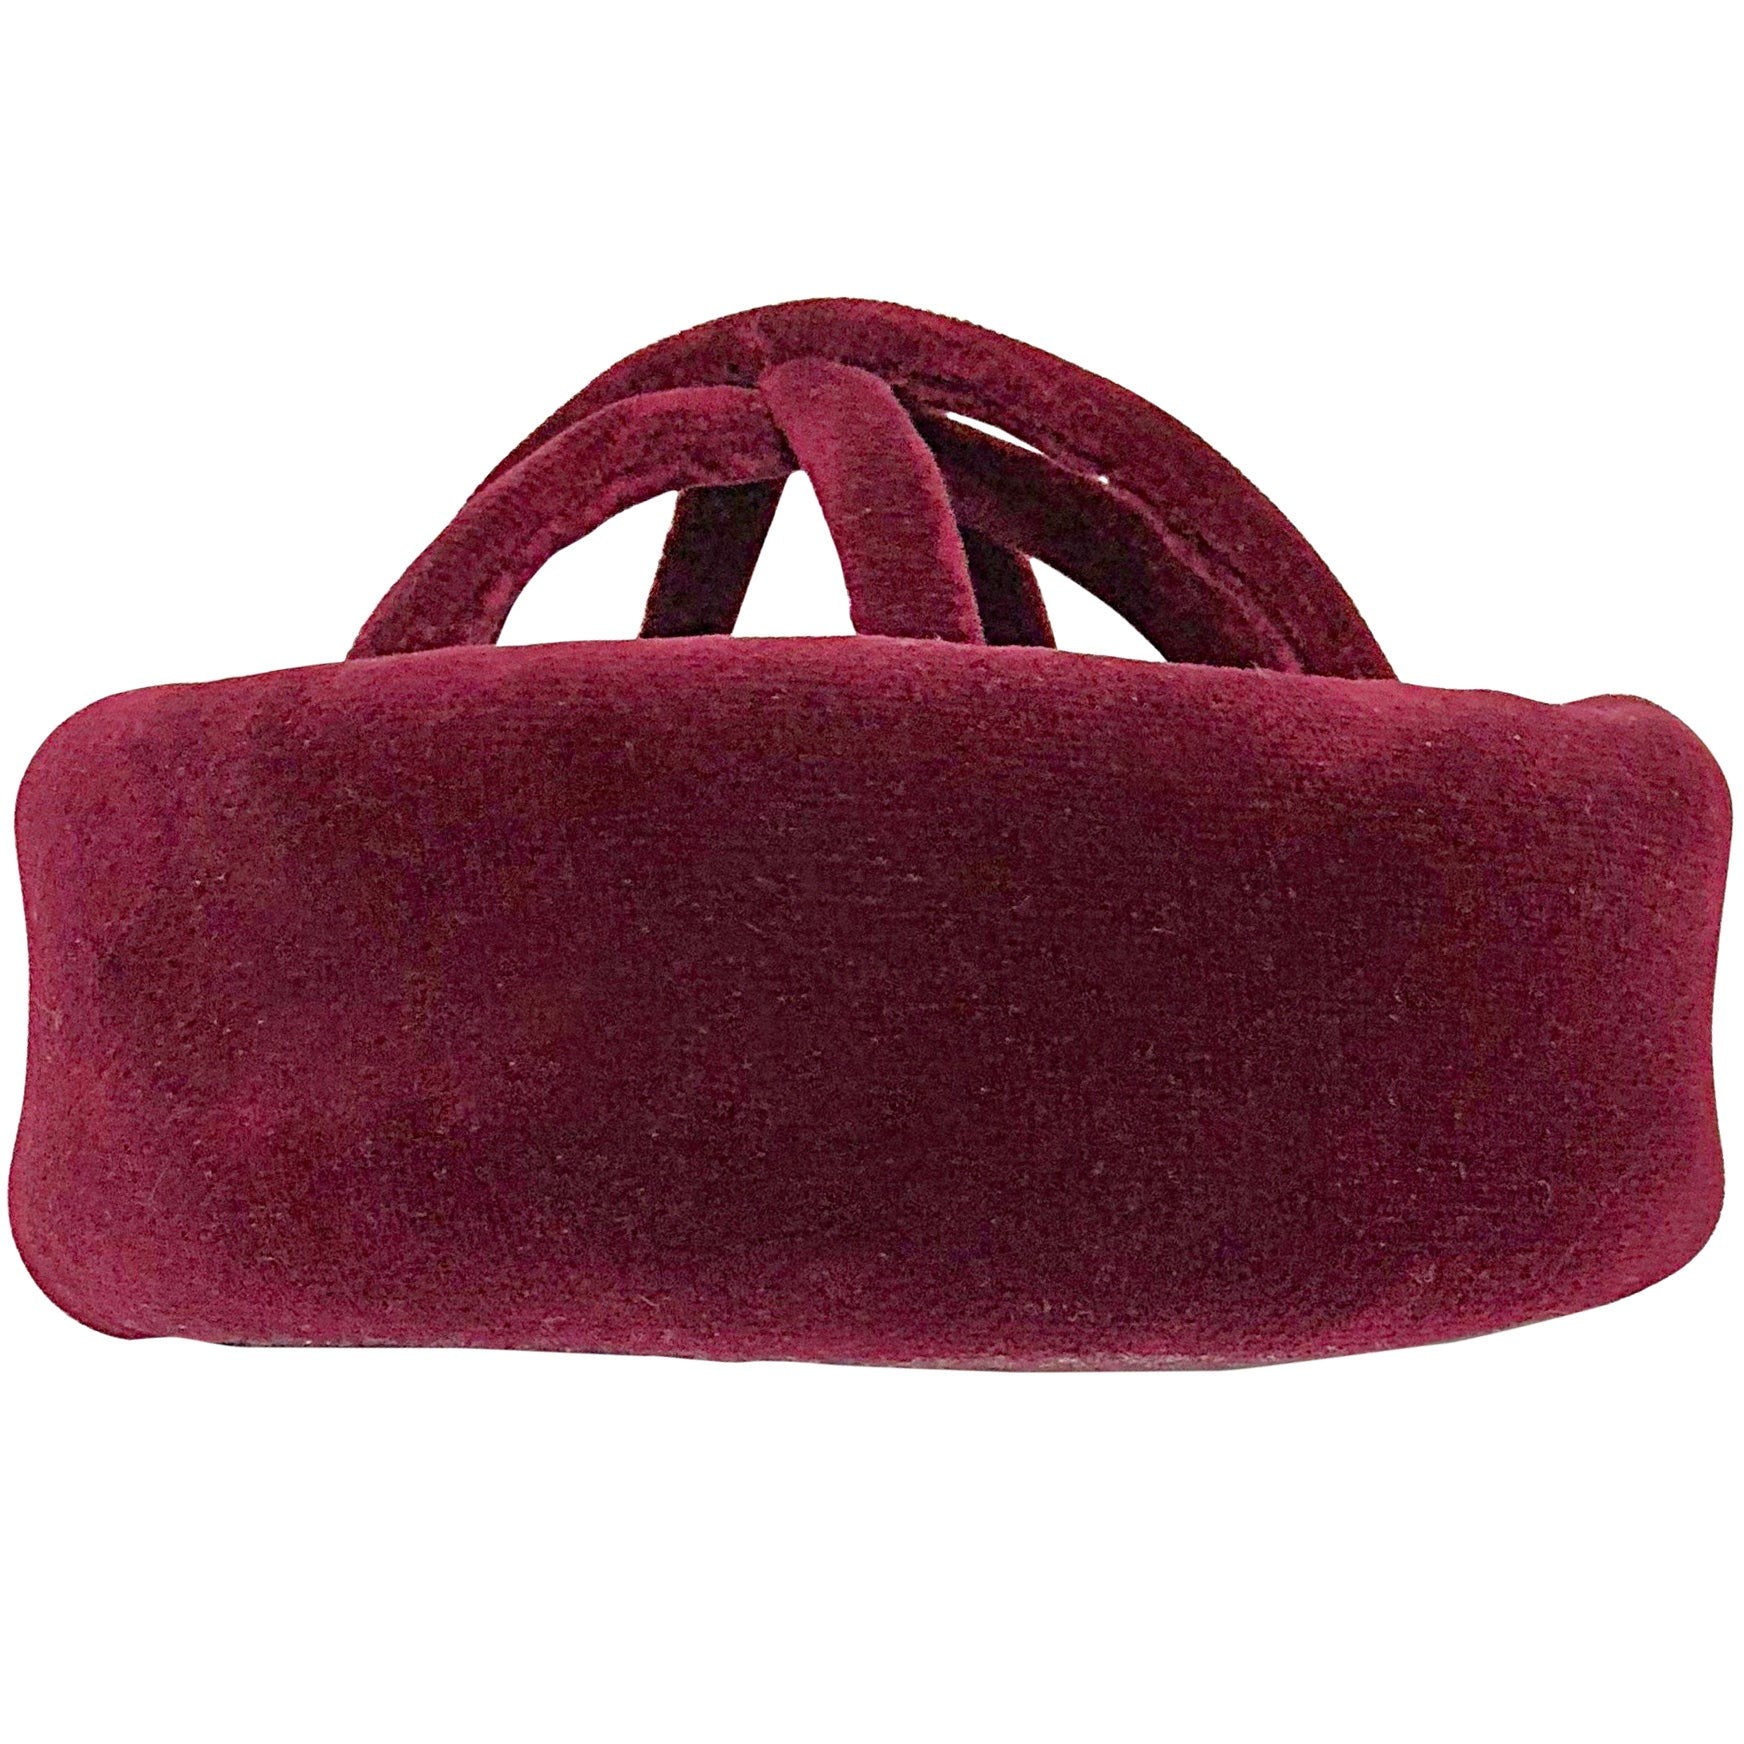 1960s Cardinali Original Sample Burgundy Maroon Avant Garde Velvet 60s Cage Hat